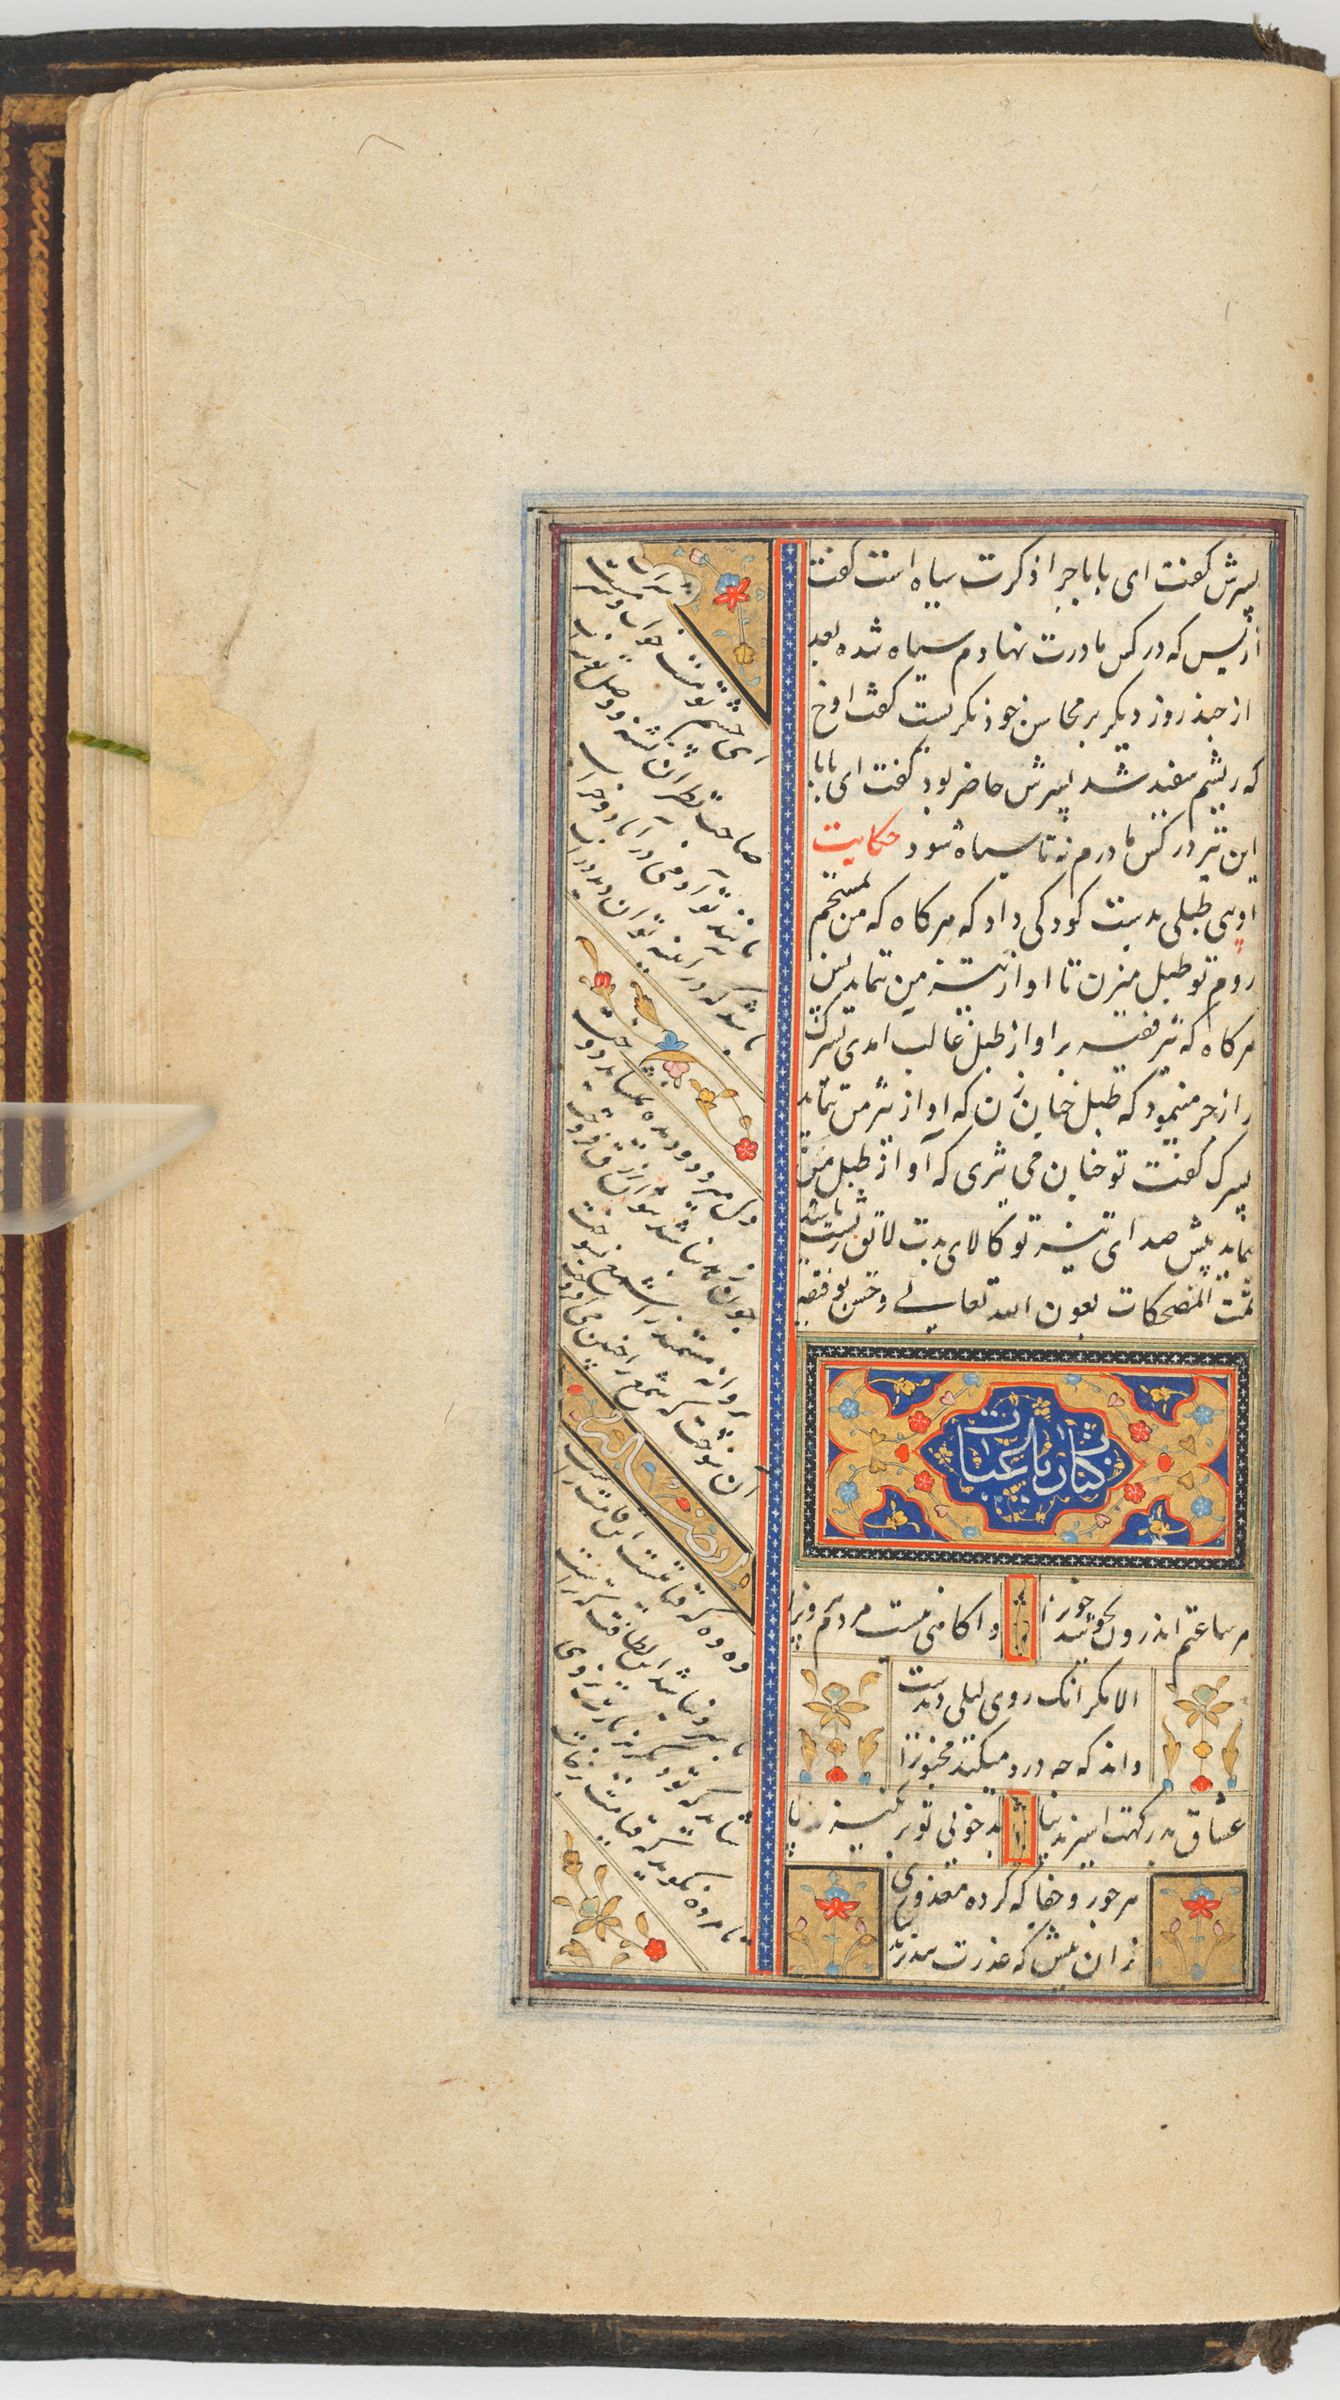 Text Folio With An Illuminated Heading (Text Recto; Text With An Illuminated Heading Verso Of Folio 340), From A Manuscript Of The Kulliyat Of Sa'di